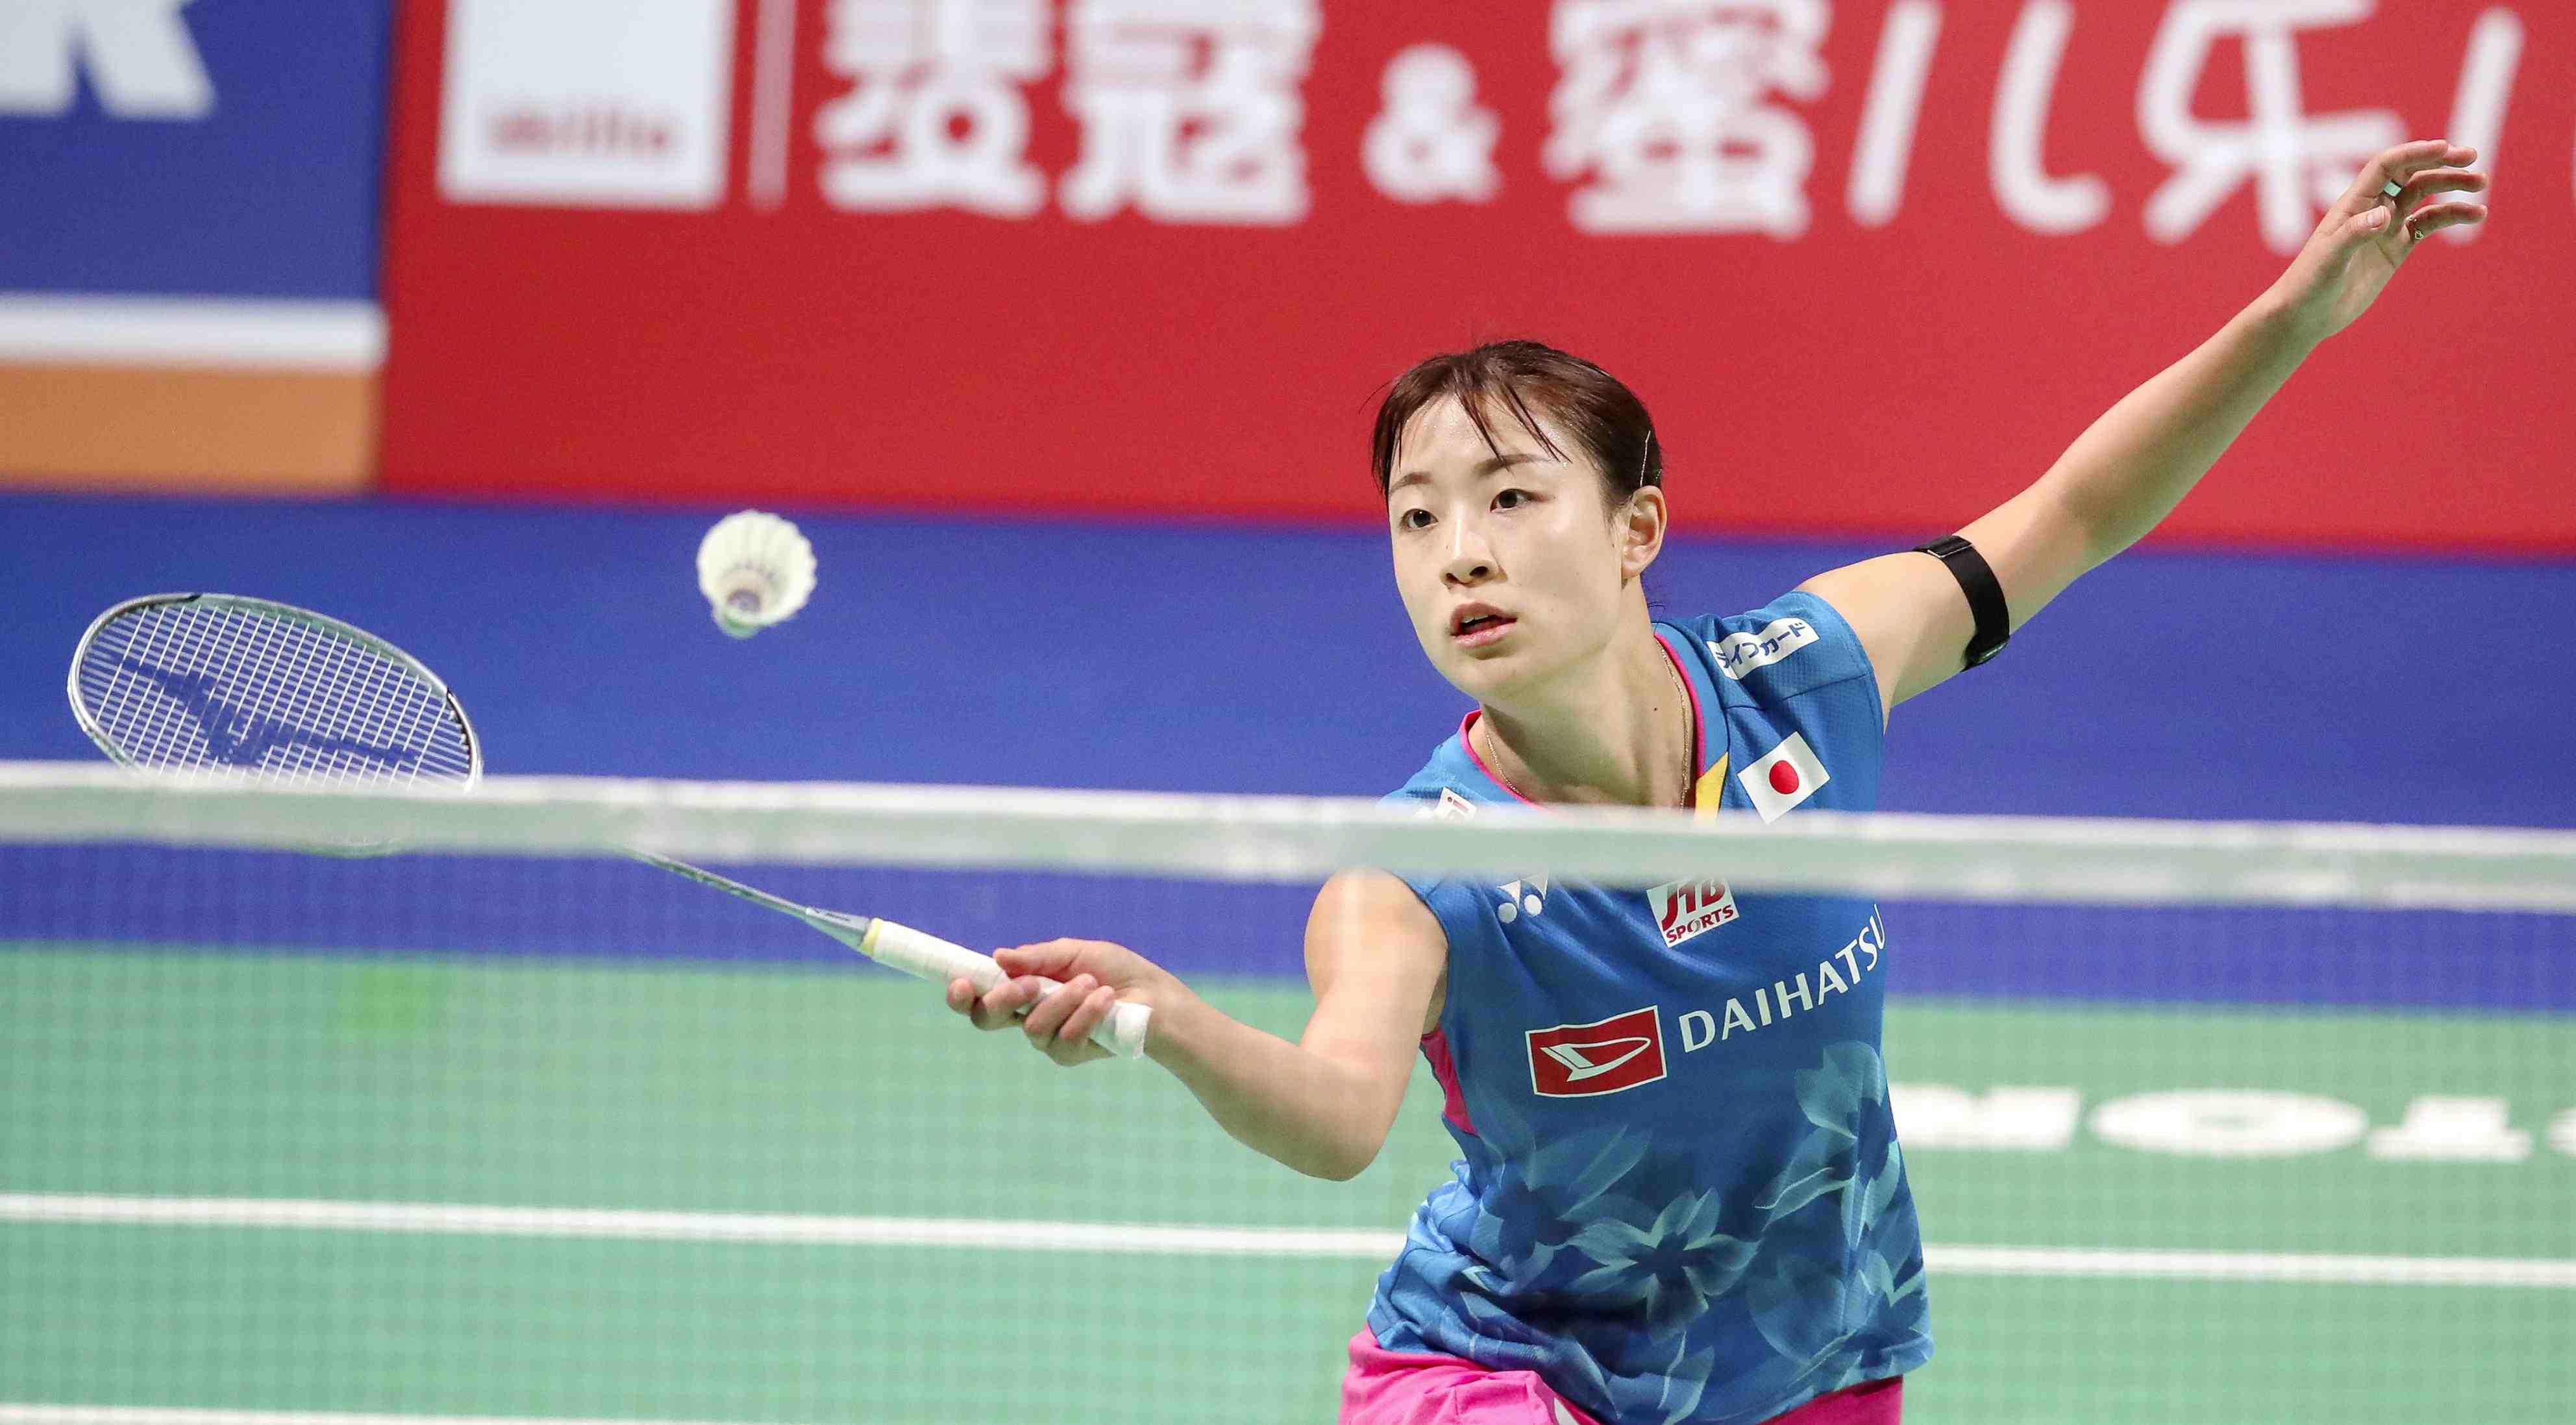 Badminton Nozomi Okuhara was the winner of the Denmark Open 005